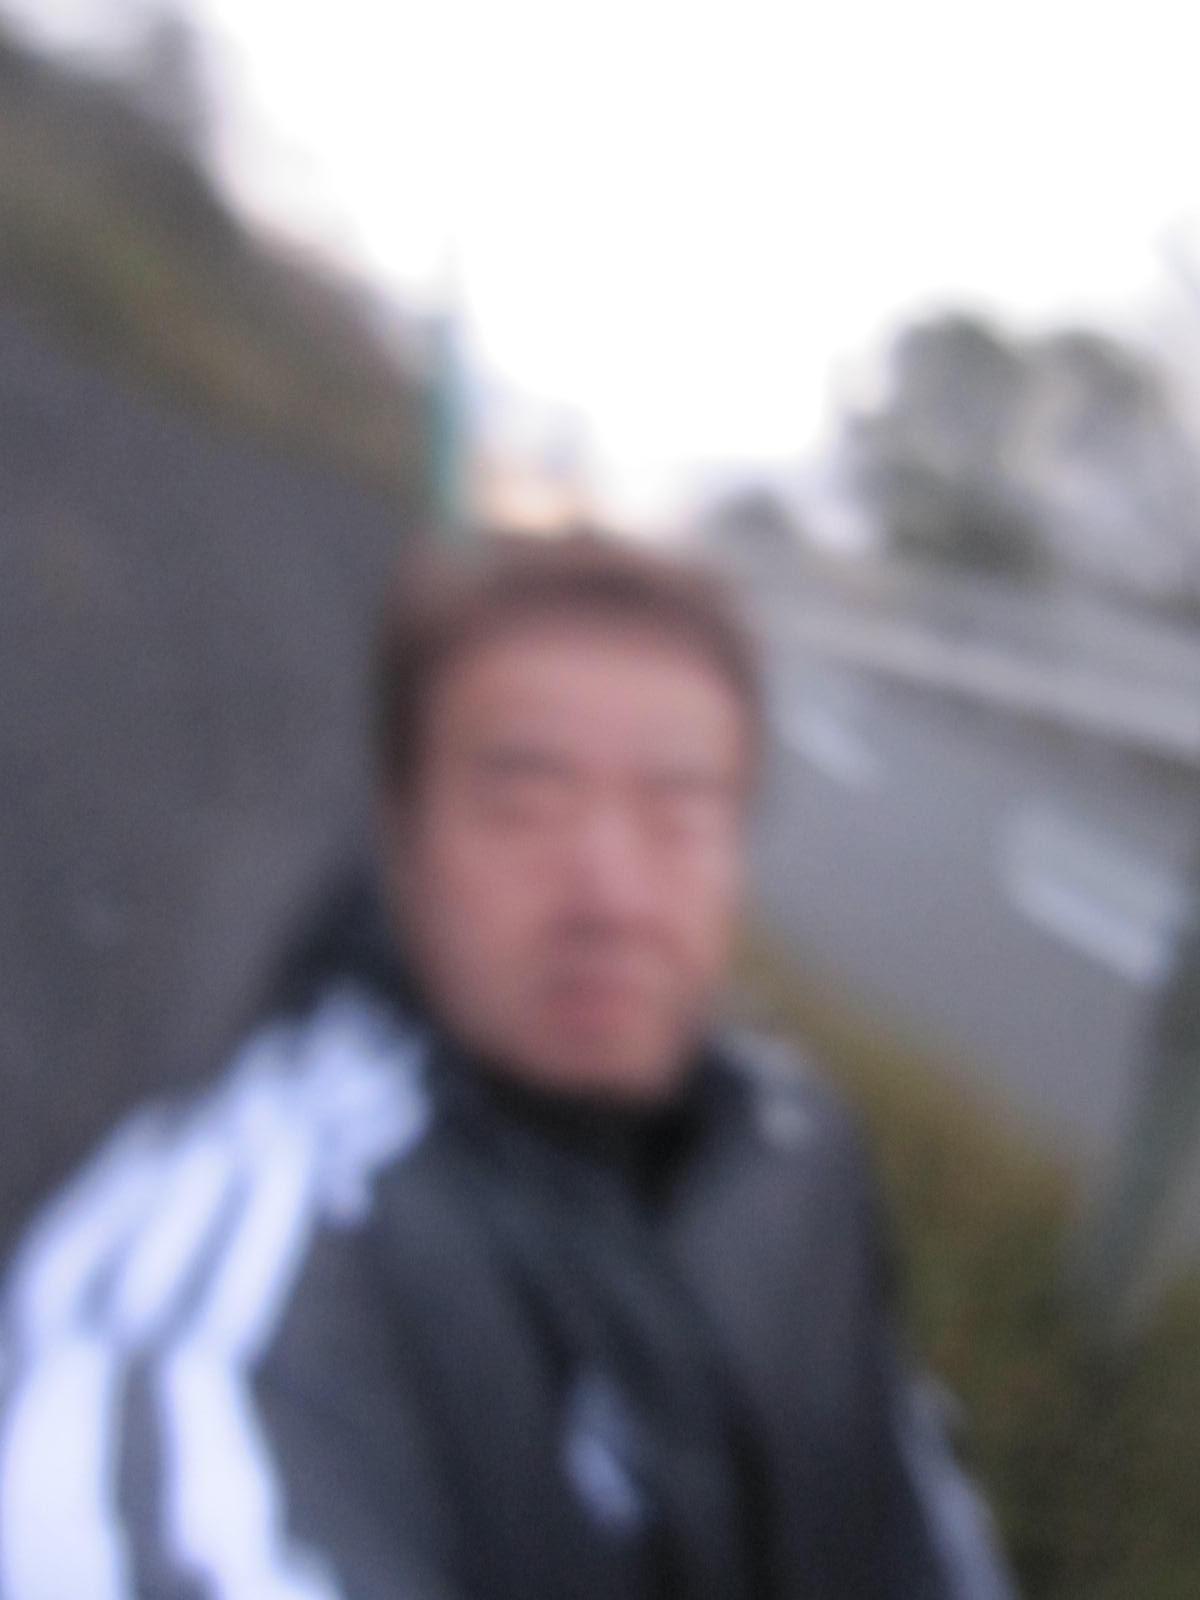 c0039520_16551577.jpg